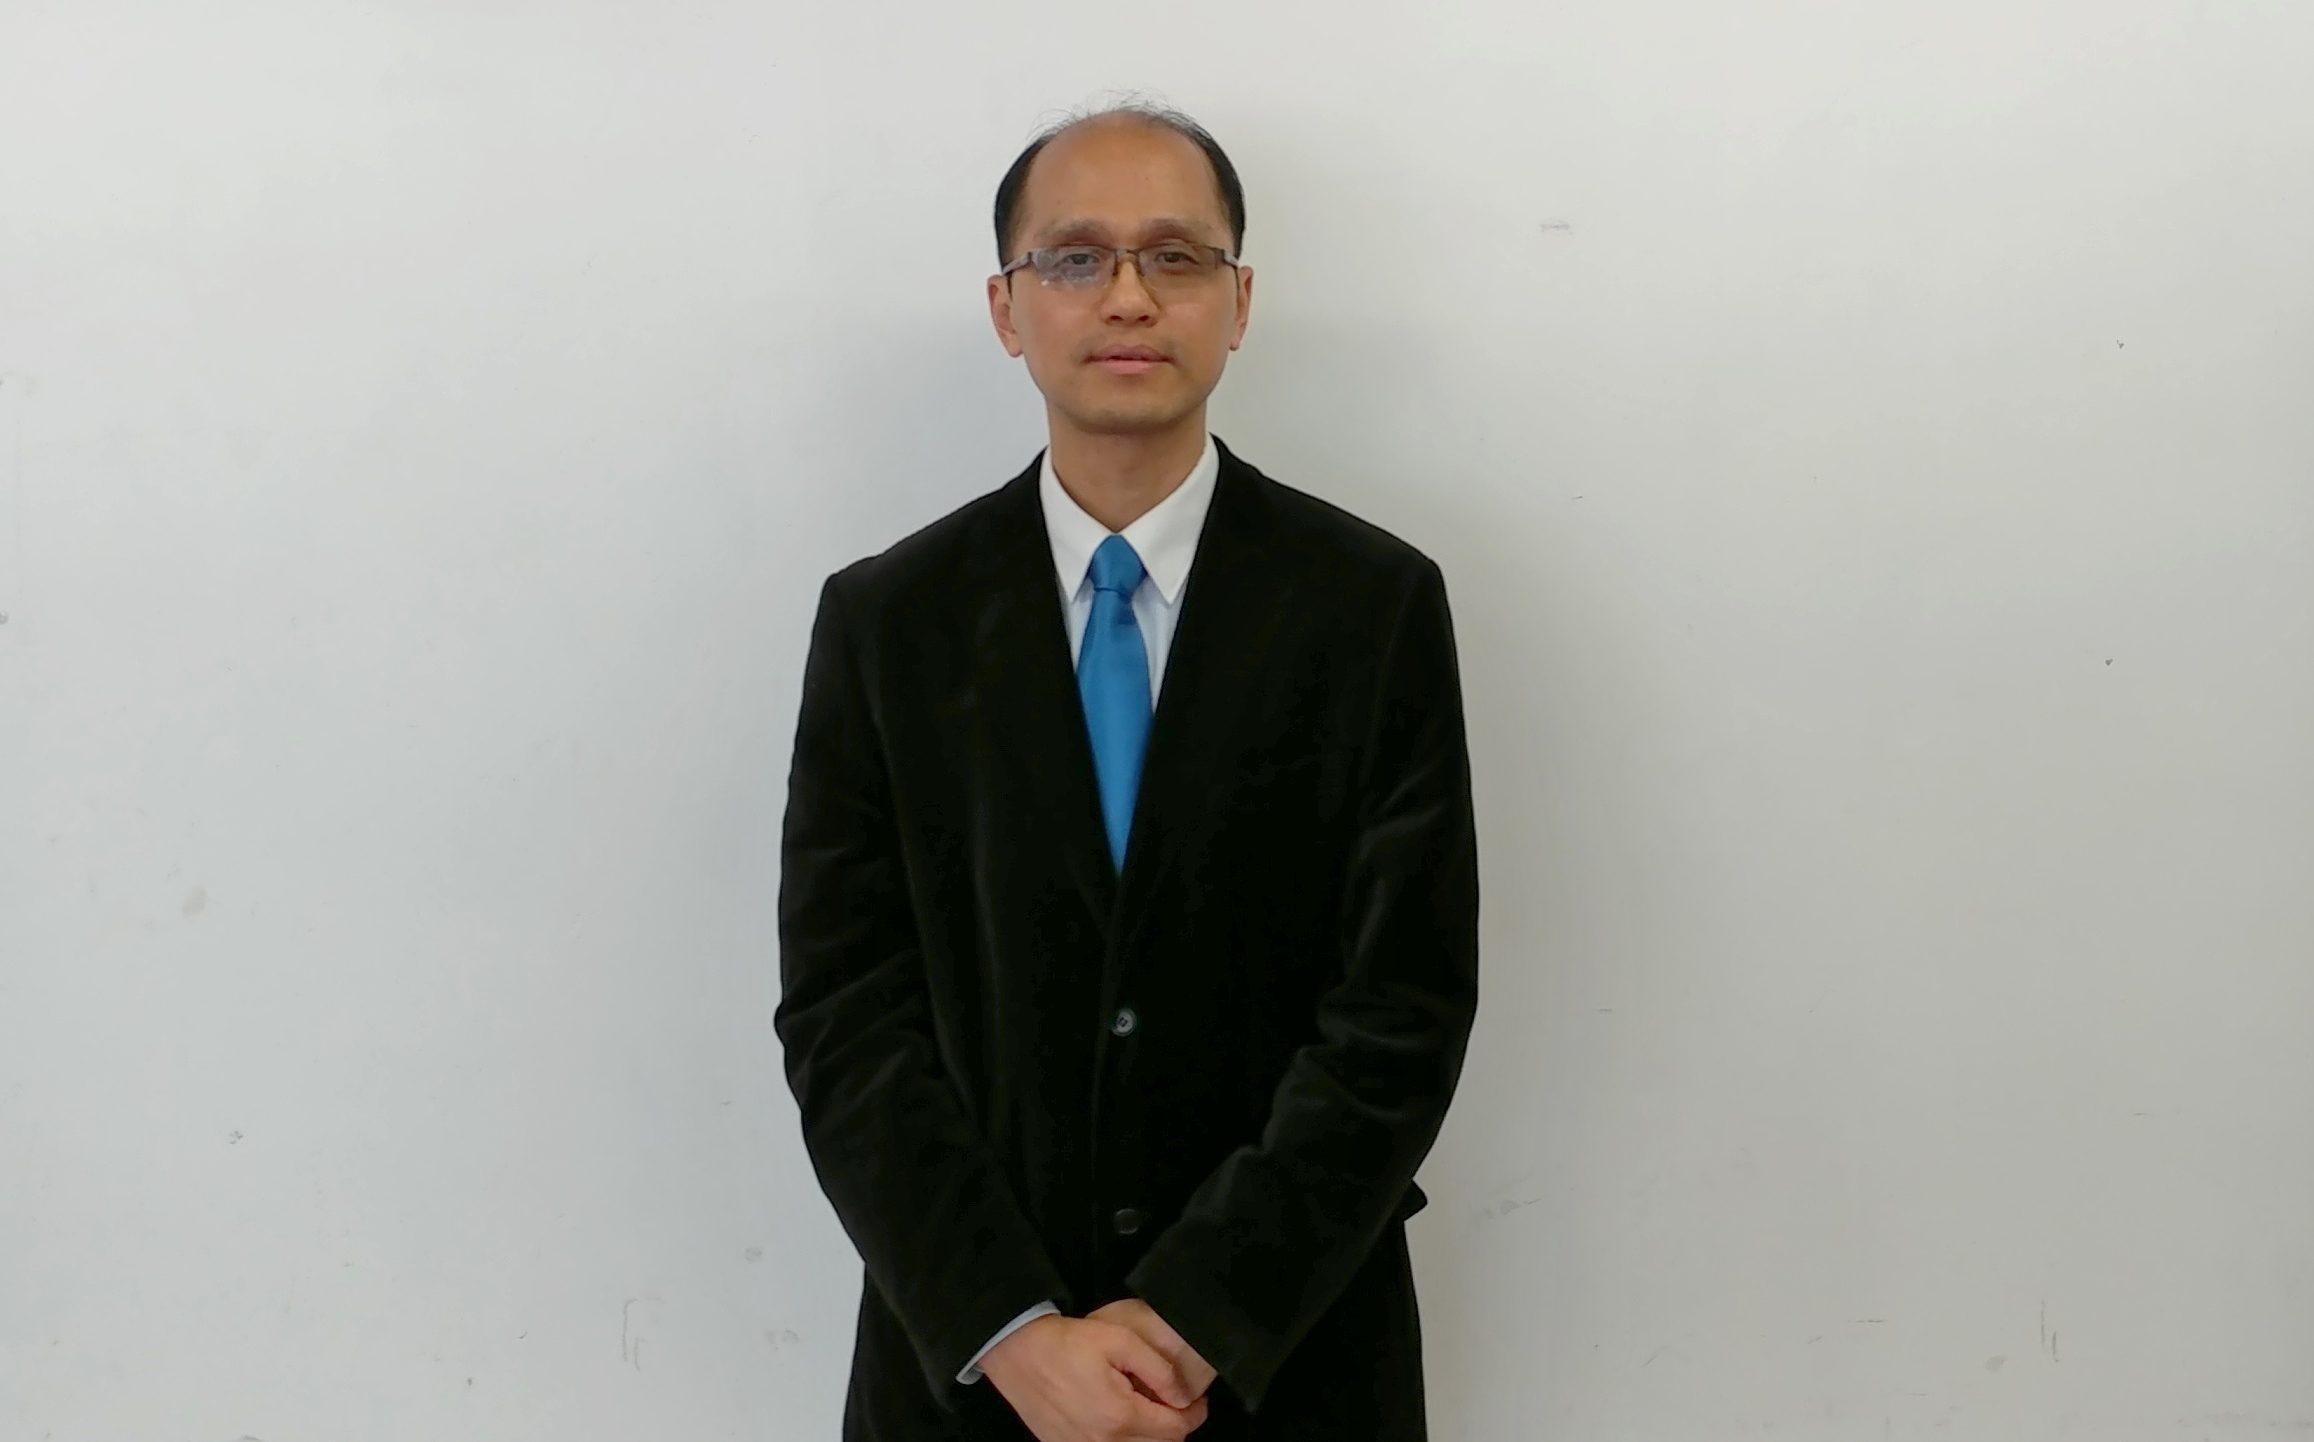 Prof. LAU Wing-fat, Wilfred